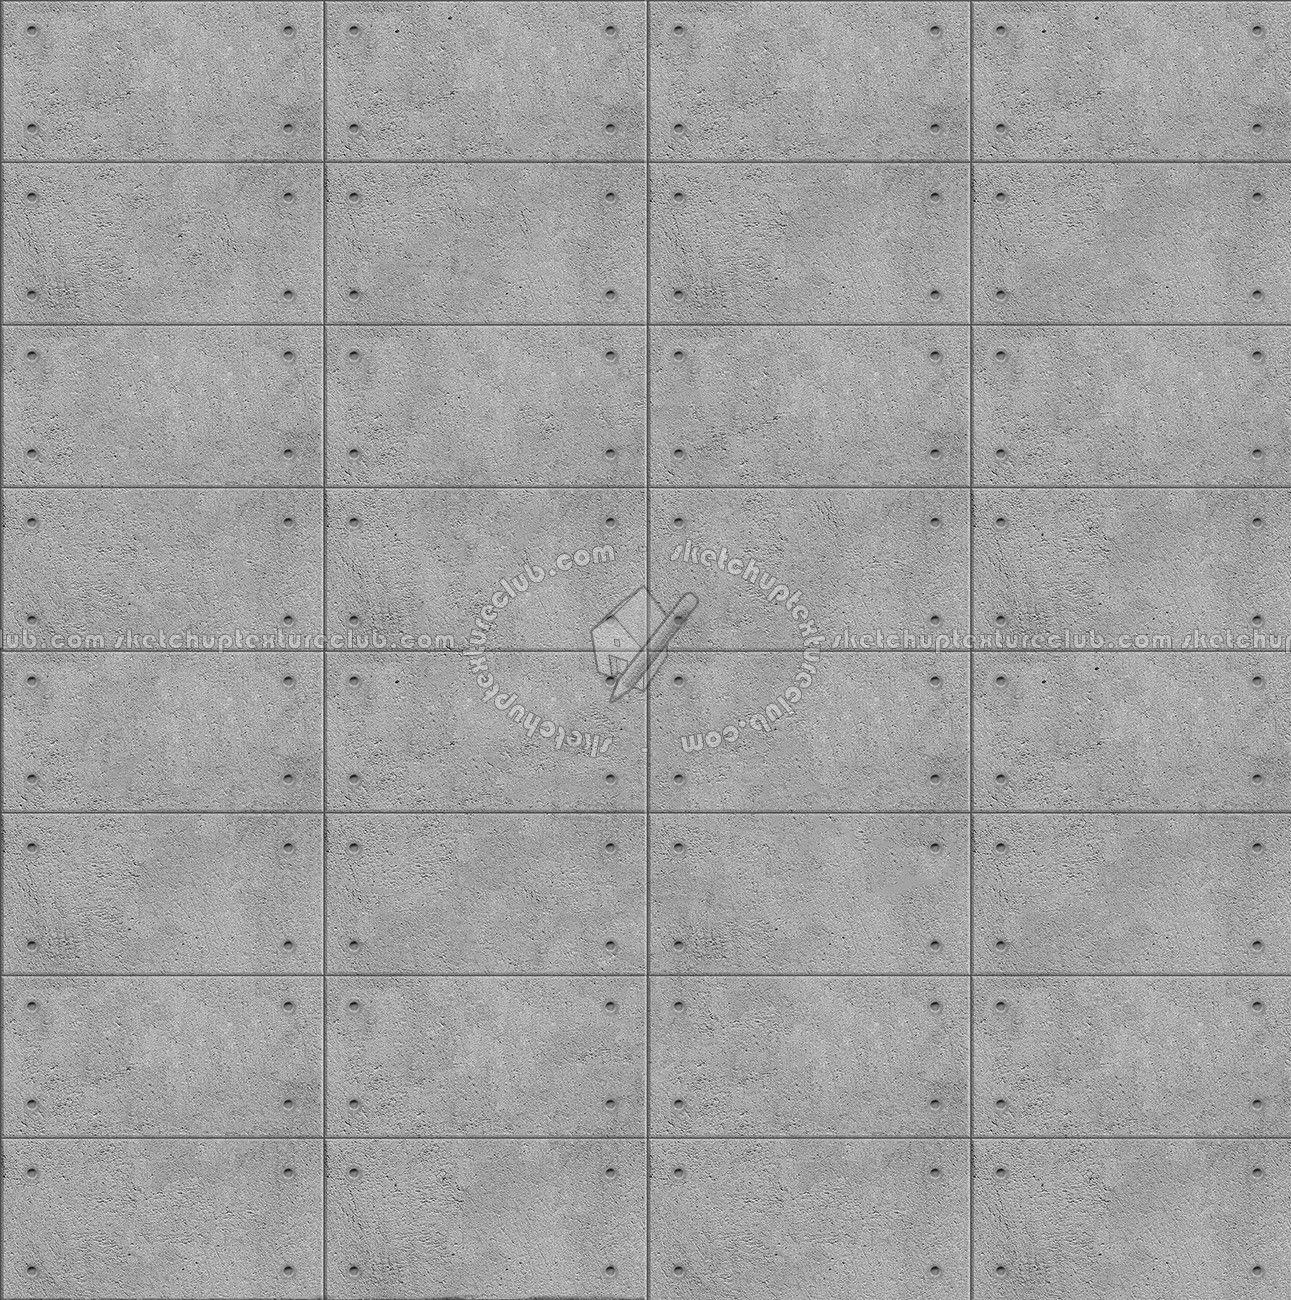 Tadao Ando Concrete Plates Seamless 01825 In 2020 Plates On Wall Tadao Ando Concrete